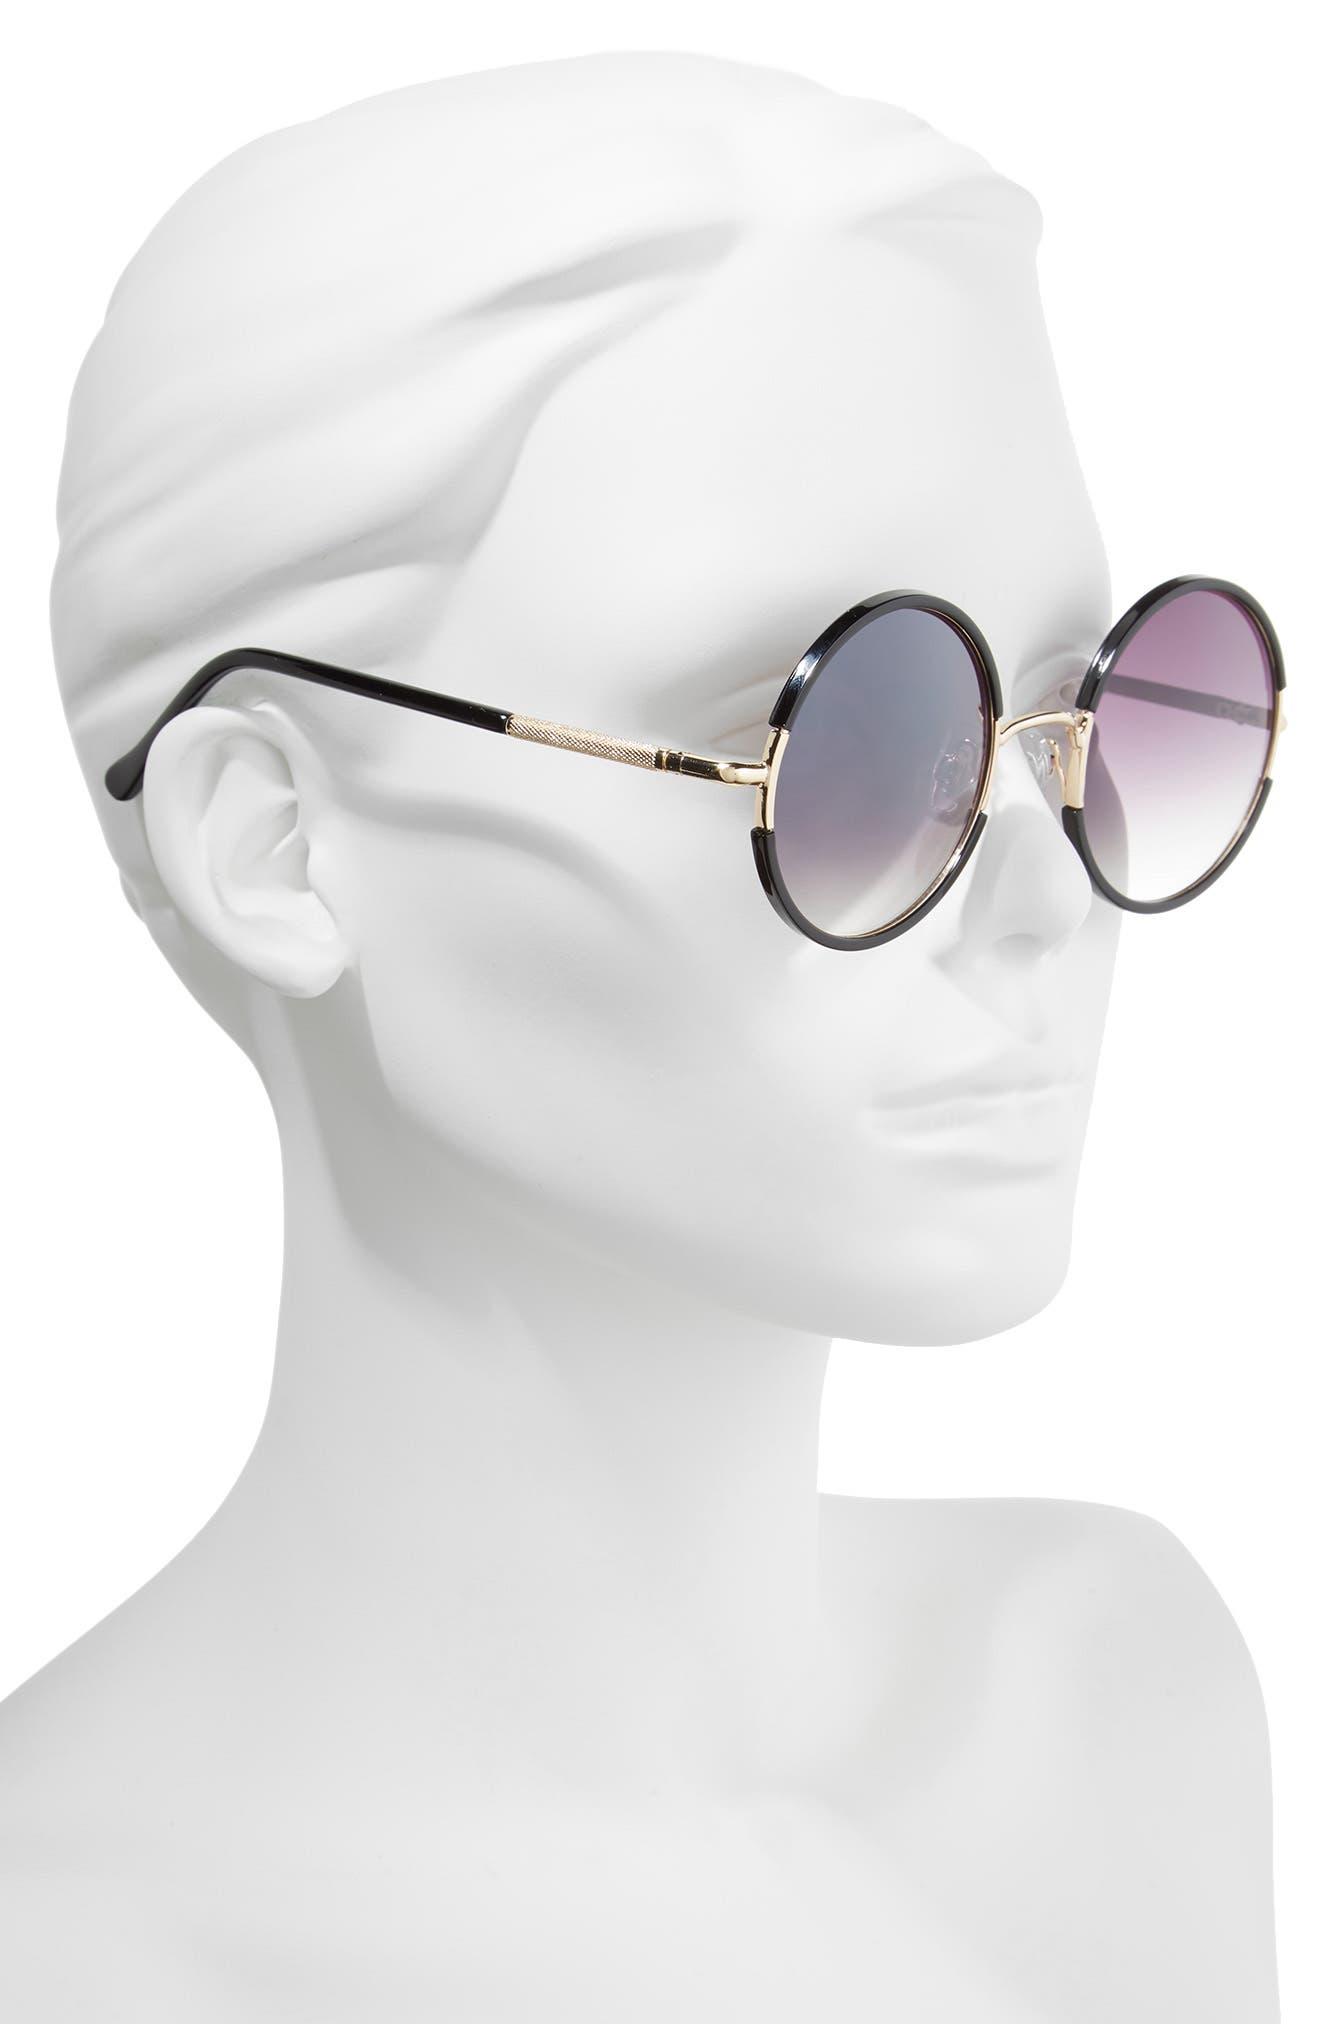 52mm Gradient Round Sunglasses,                             Alternate thumbnail 2, color,                             Black/ Gold